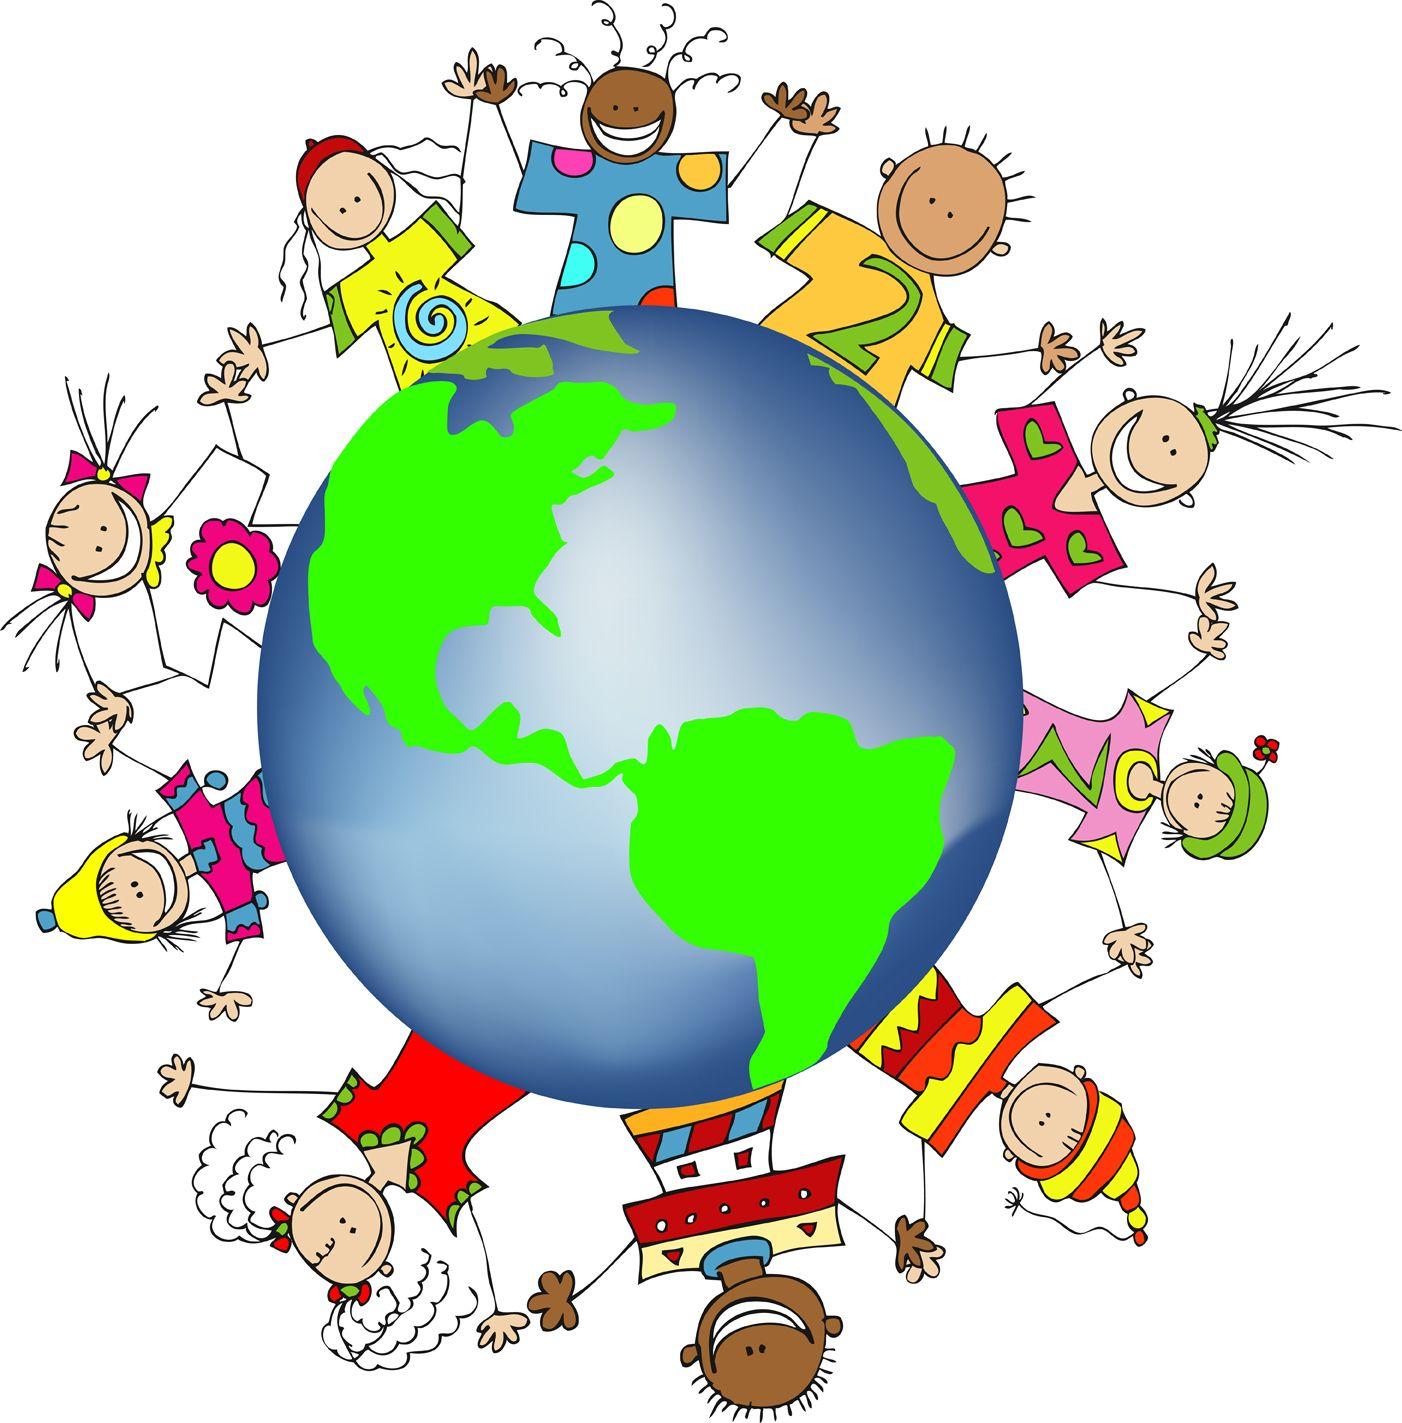 Kids World Hands Friends Networks Globe Illustration Small.